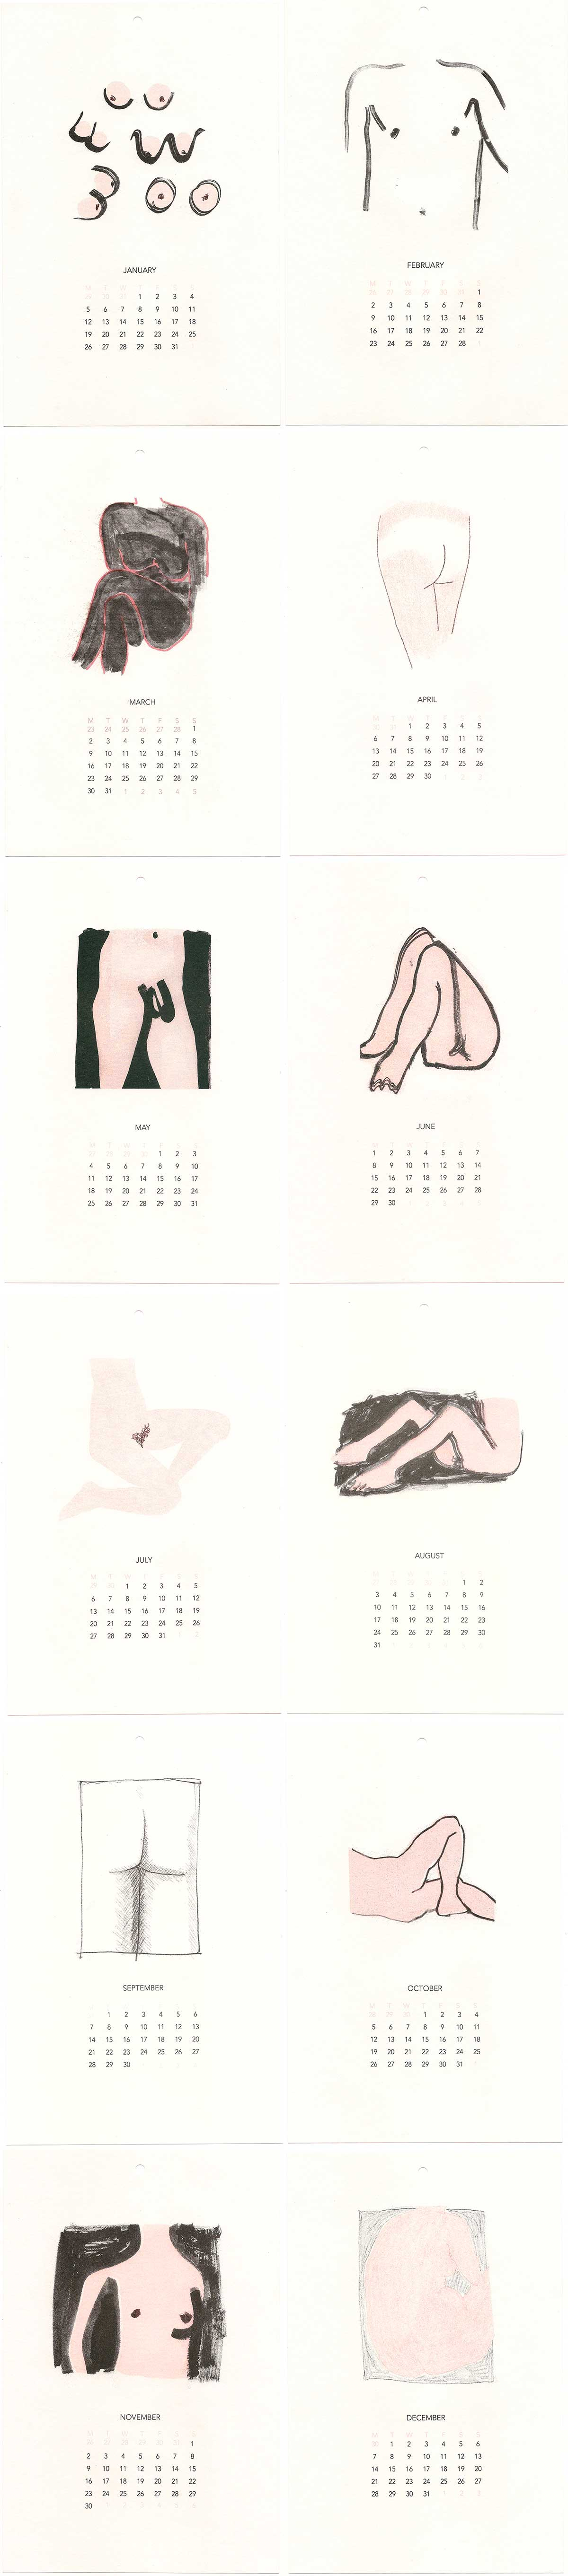 anna-gleeson-nudie-calendar-2